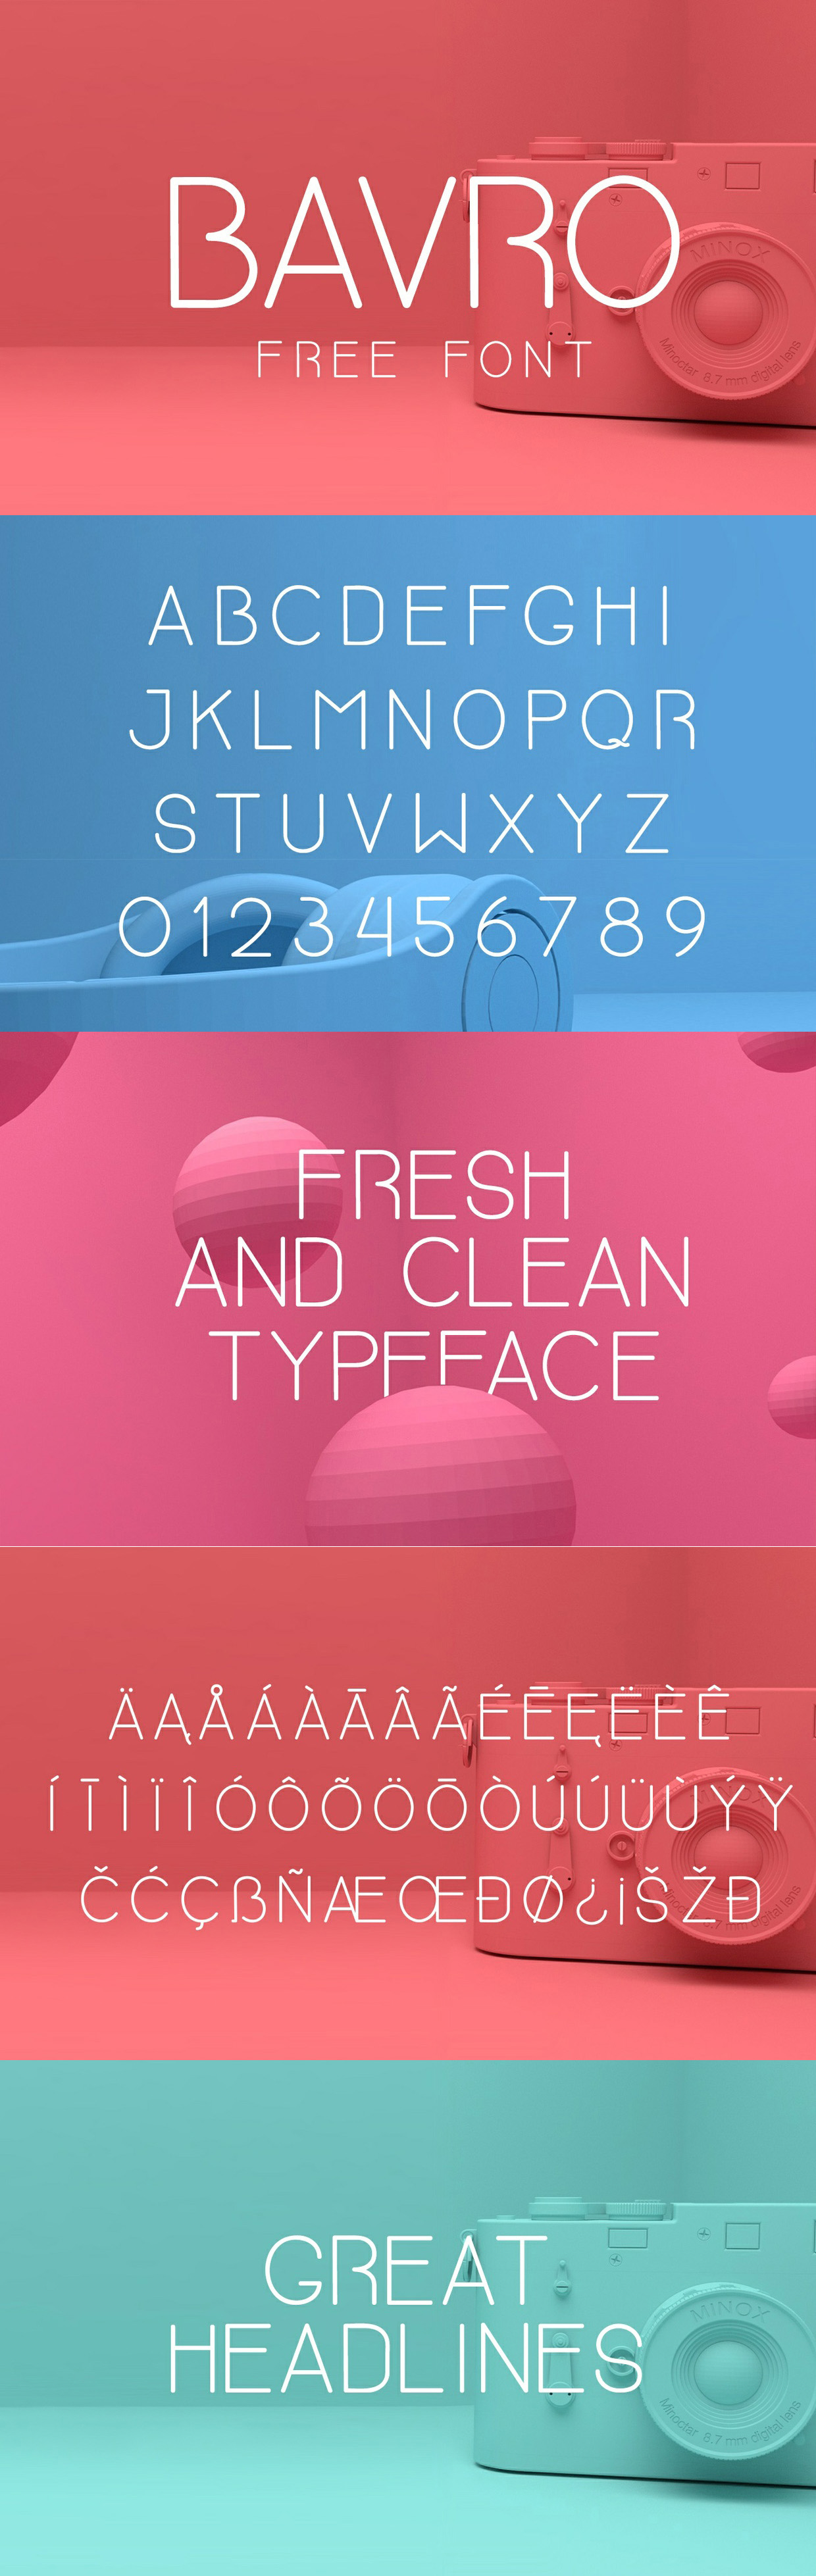 Bavro typeface